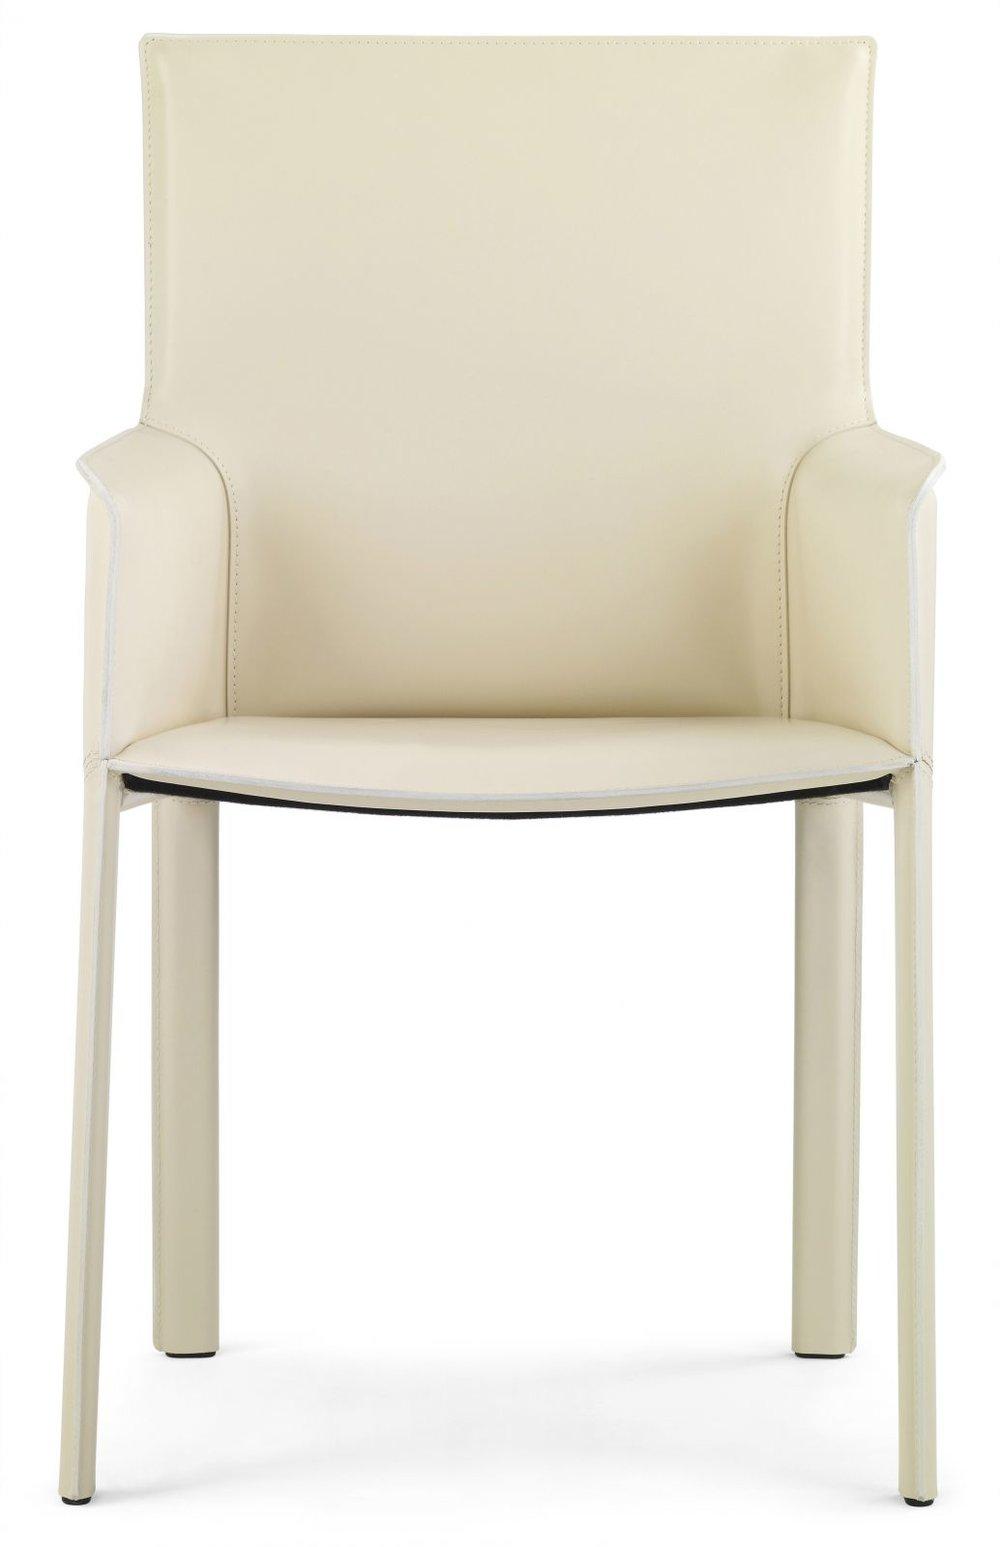 modern-office-armchairs-Italian-furniture-designer-armchairs (21).jpg